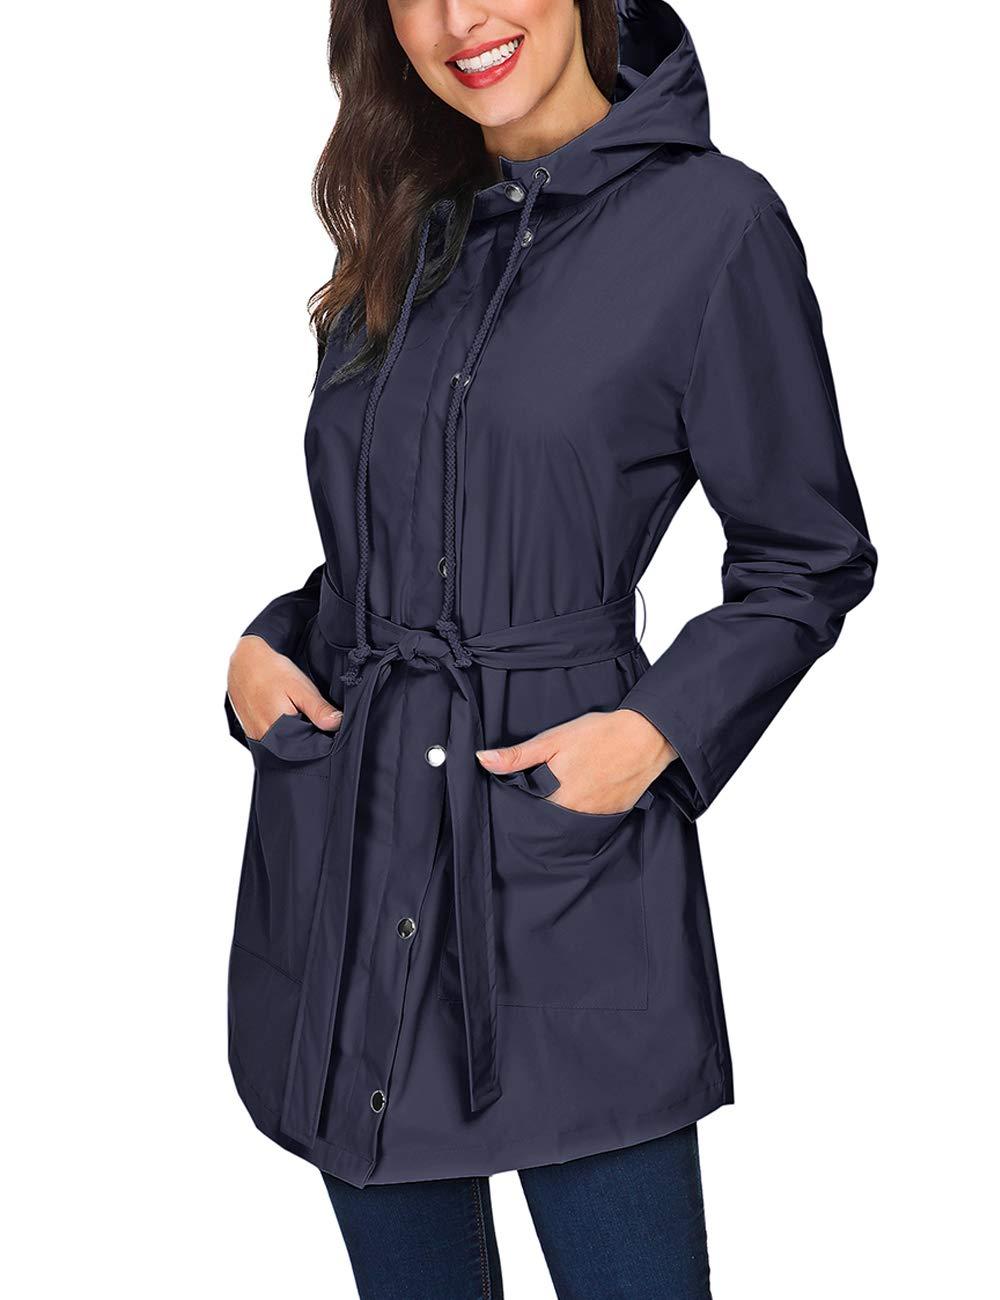 ZHENWEI Women's Rain Jacket with Hood Waterproof Lightweight Nylon Lined Raincoat for Holiday Travel (Navy Blue,M) by ZHENWEI